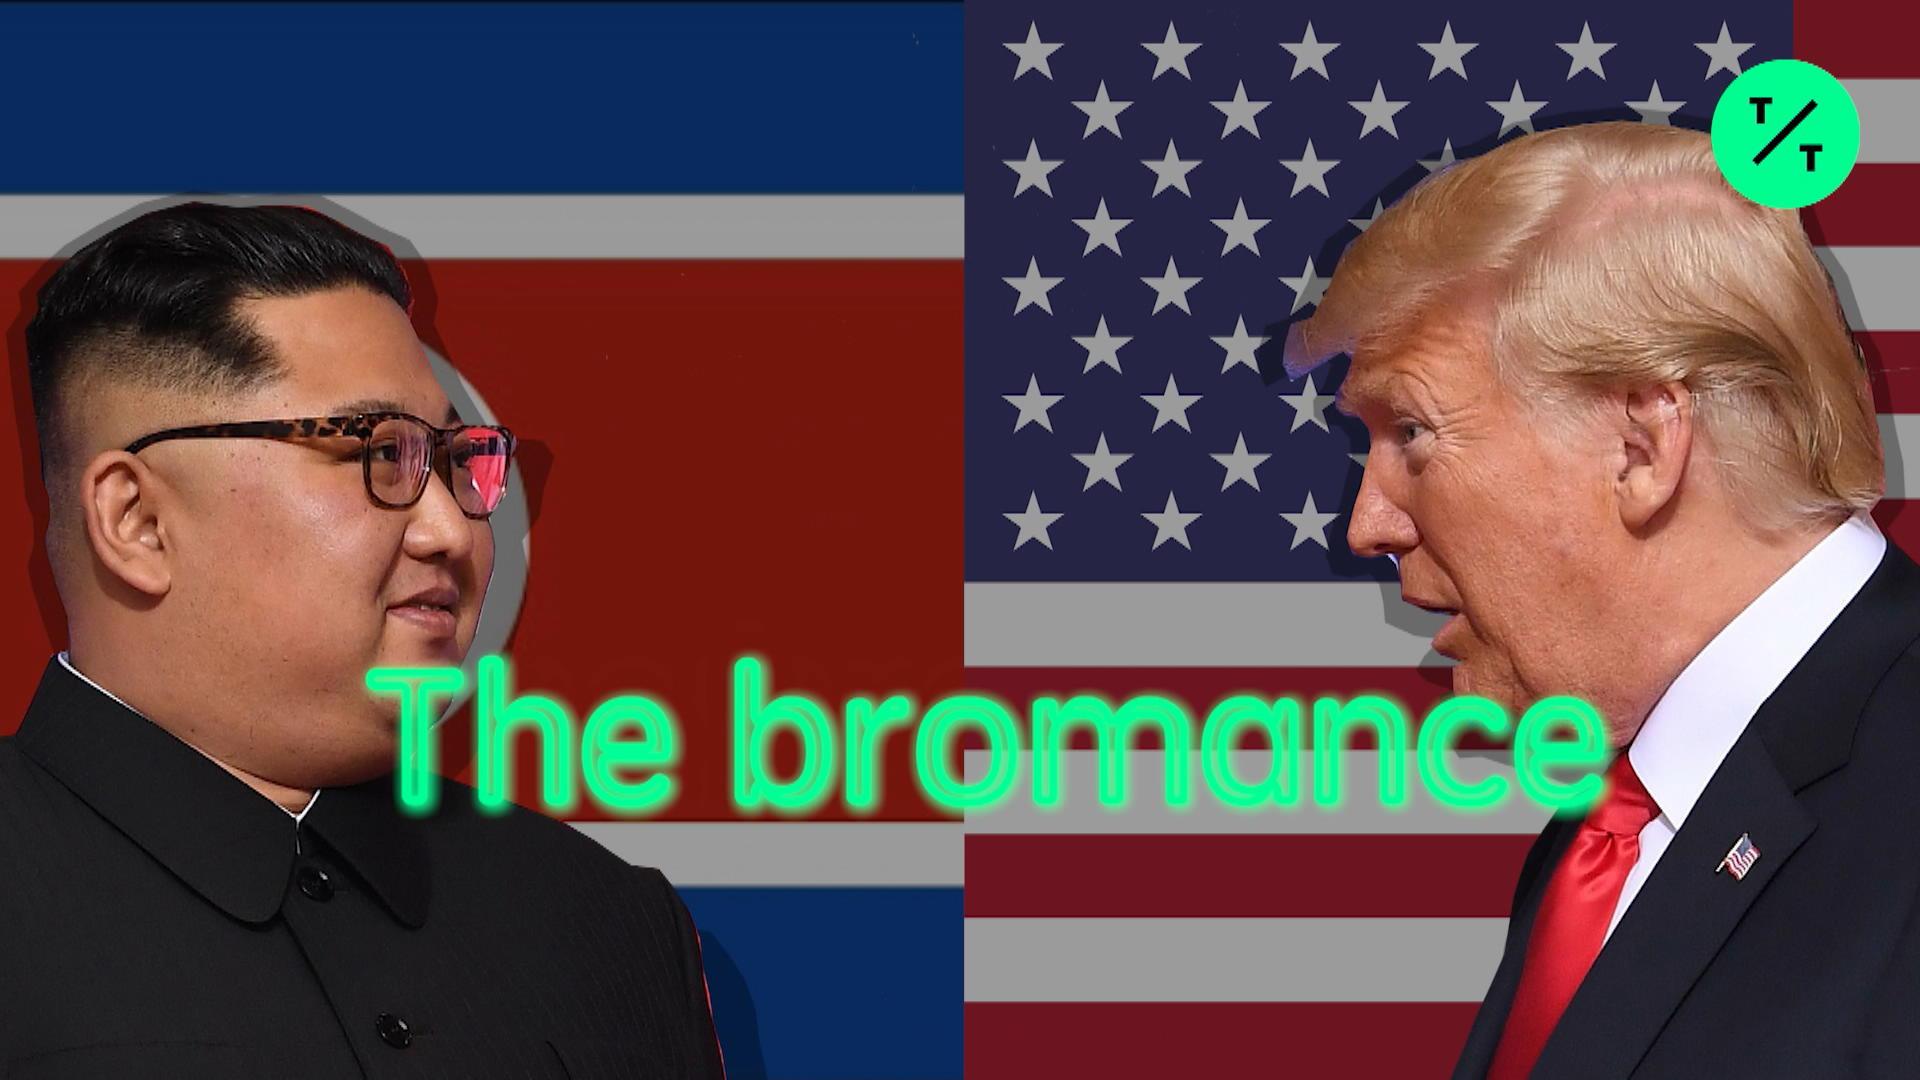 https://www bloomberg com/news/videos/2019-02-15